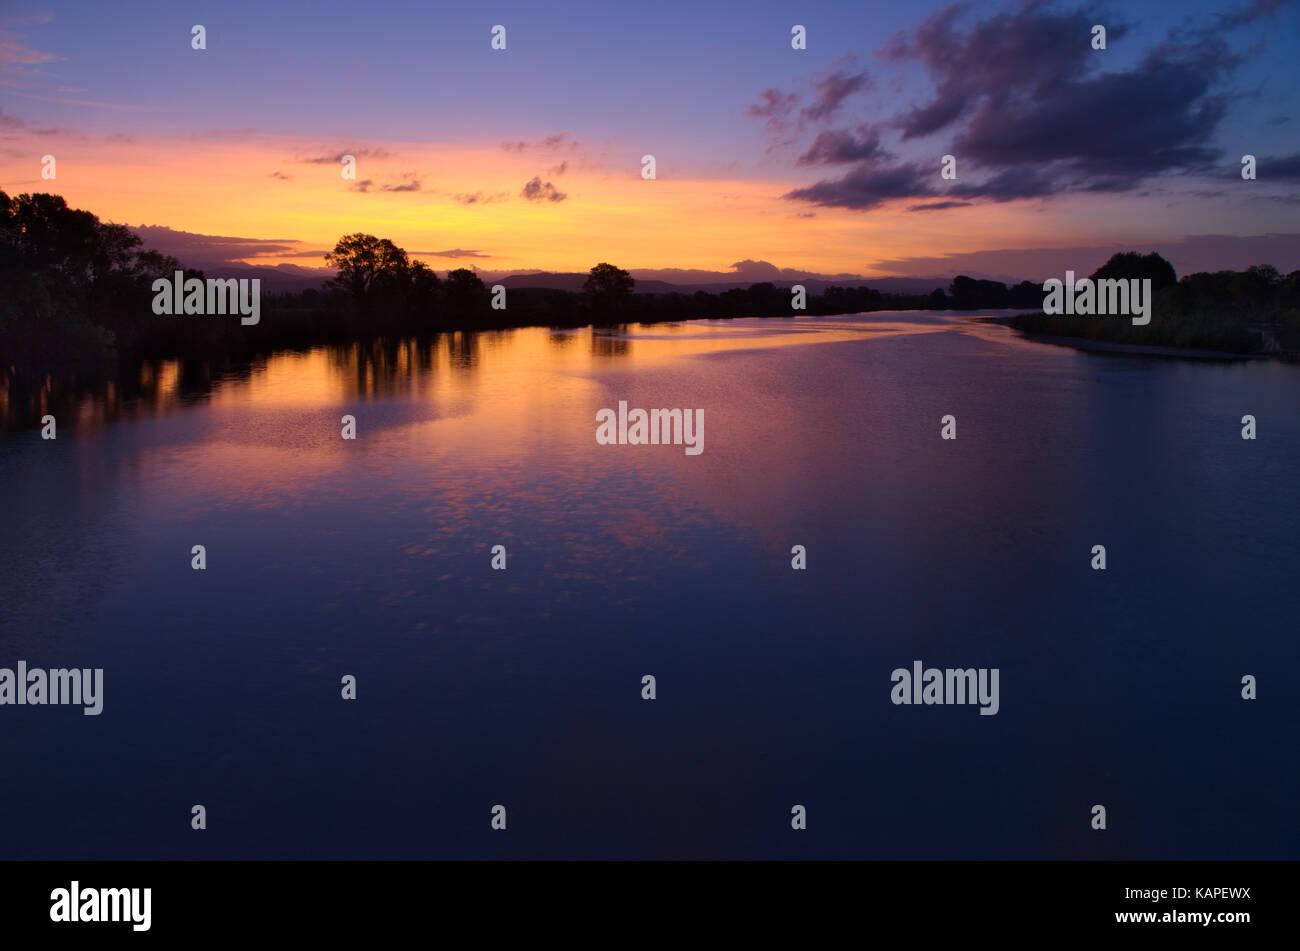 Sunset on the delta of Isonzo (Soca) river, blue hour, Gorizia, Italy - Stock Image